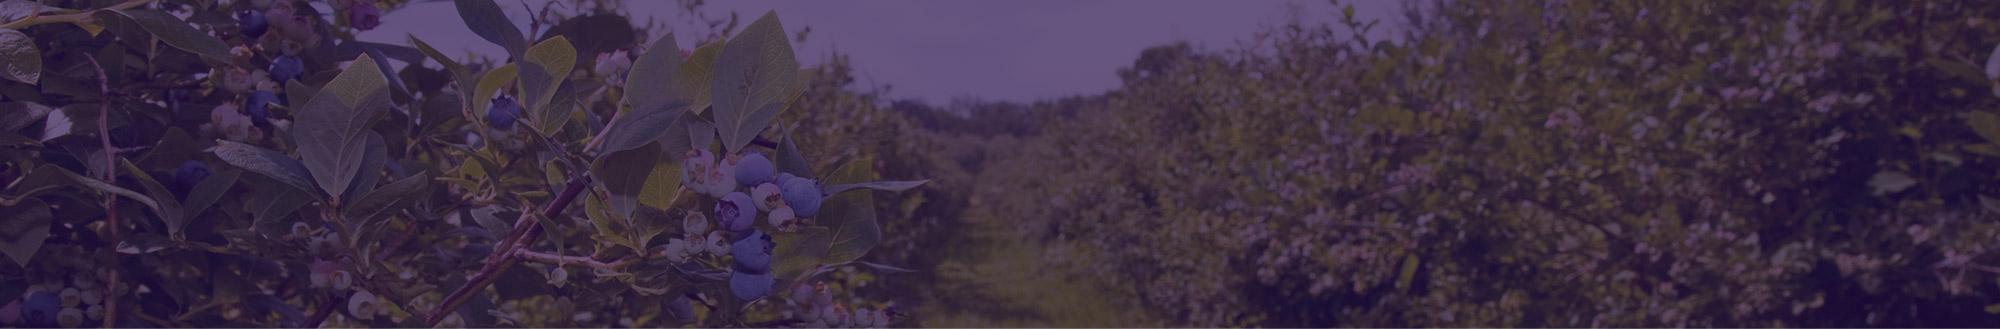 Arándanos ecológicos Campoberry